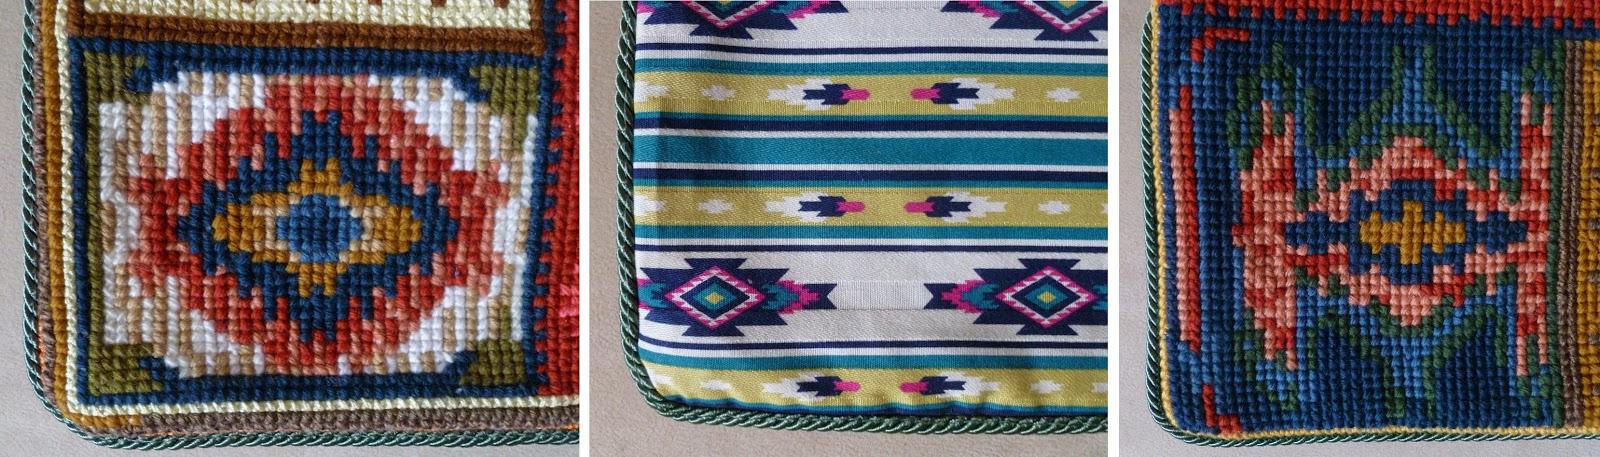 Вышивка на крупной канве подушки